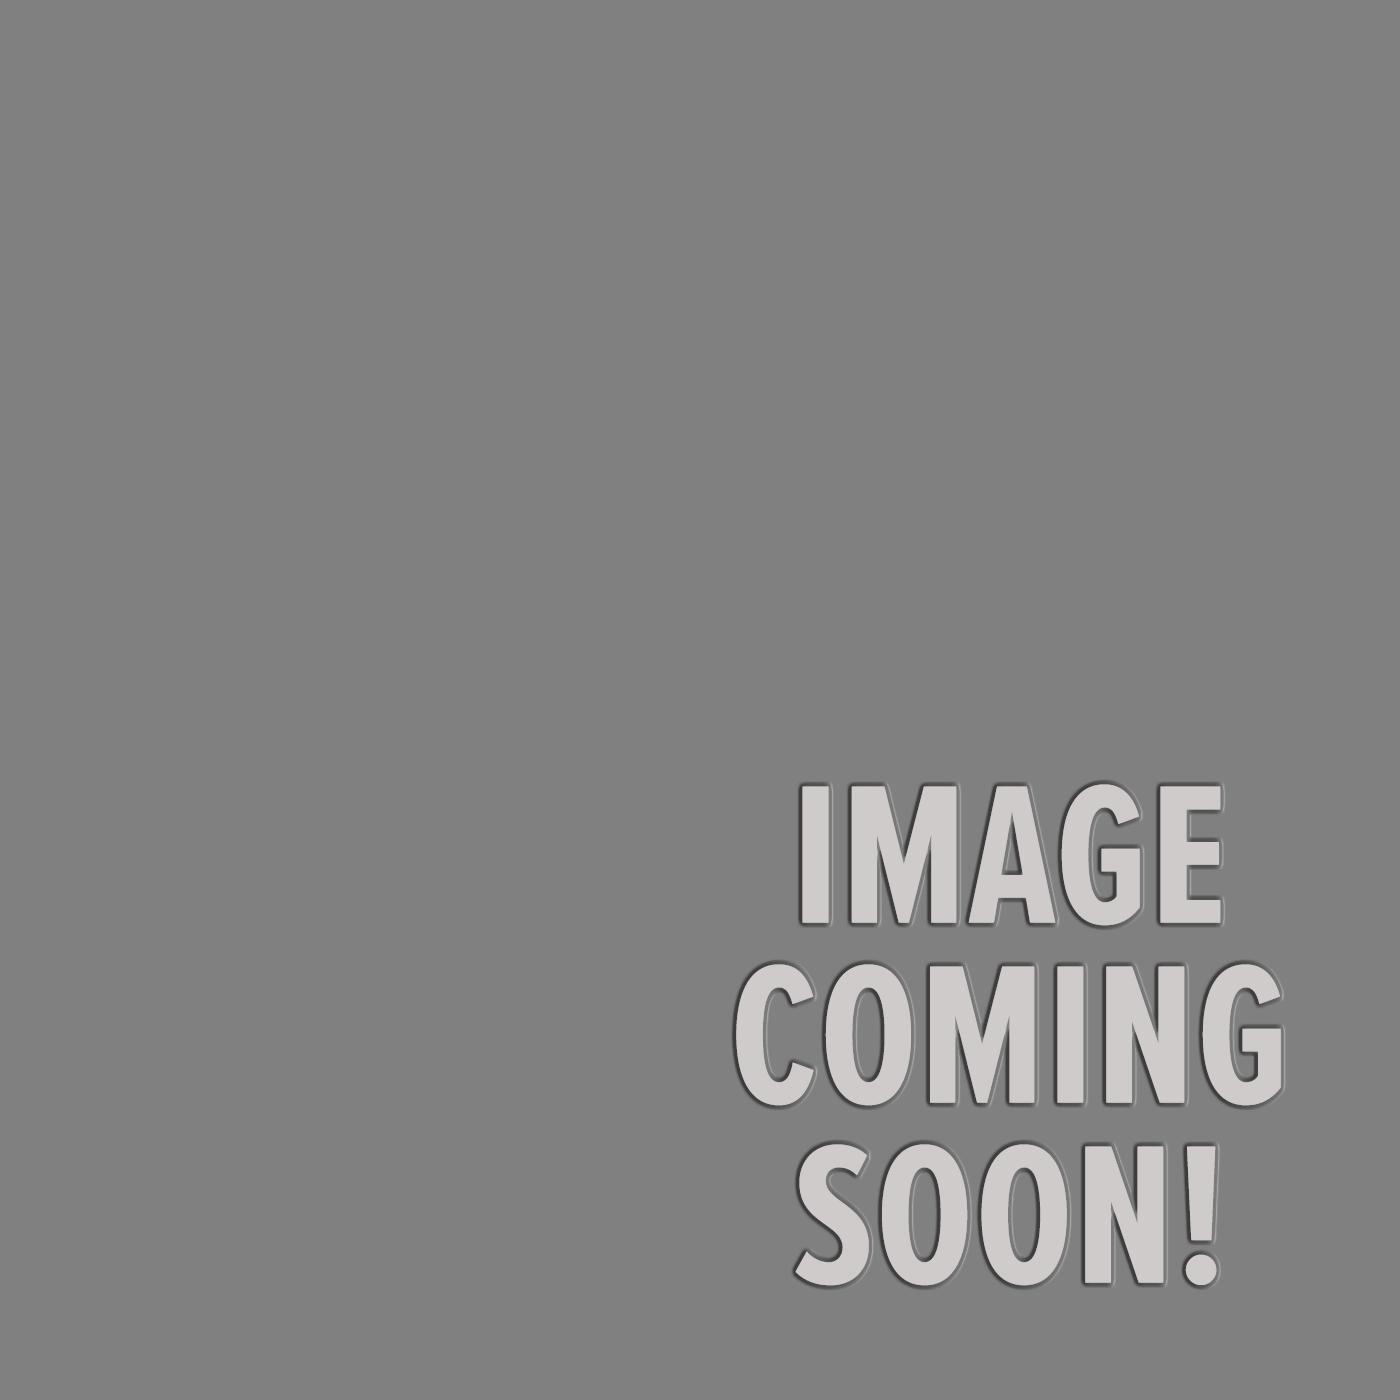 Image for EJ19 Bluegrass Light Top/Med Bottom Phos Bronze Acoustic Guitar Strings from SamAsh